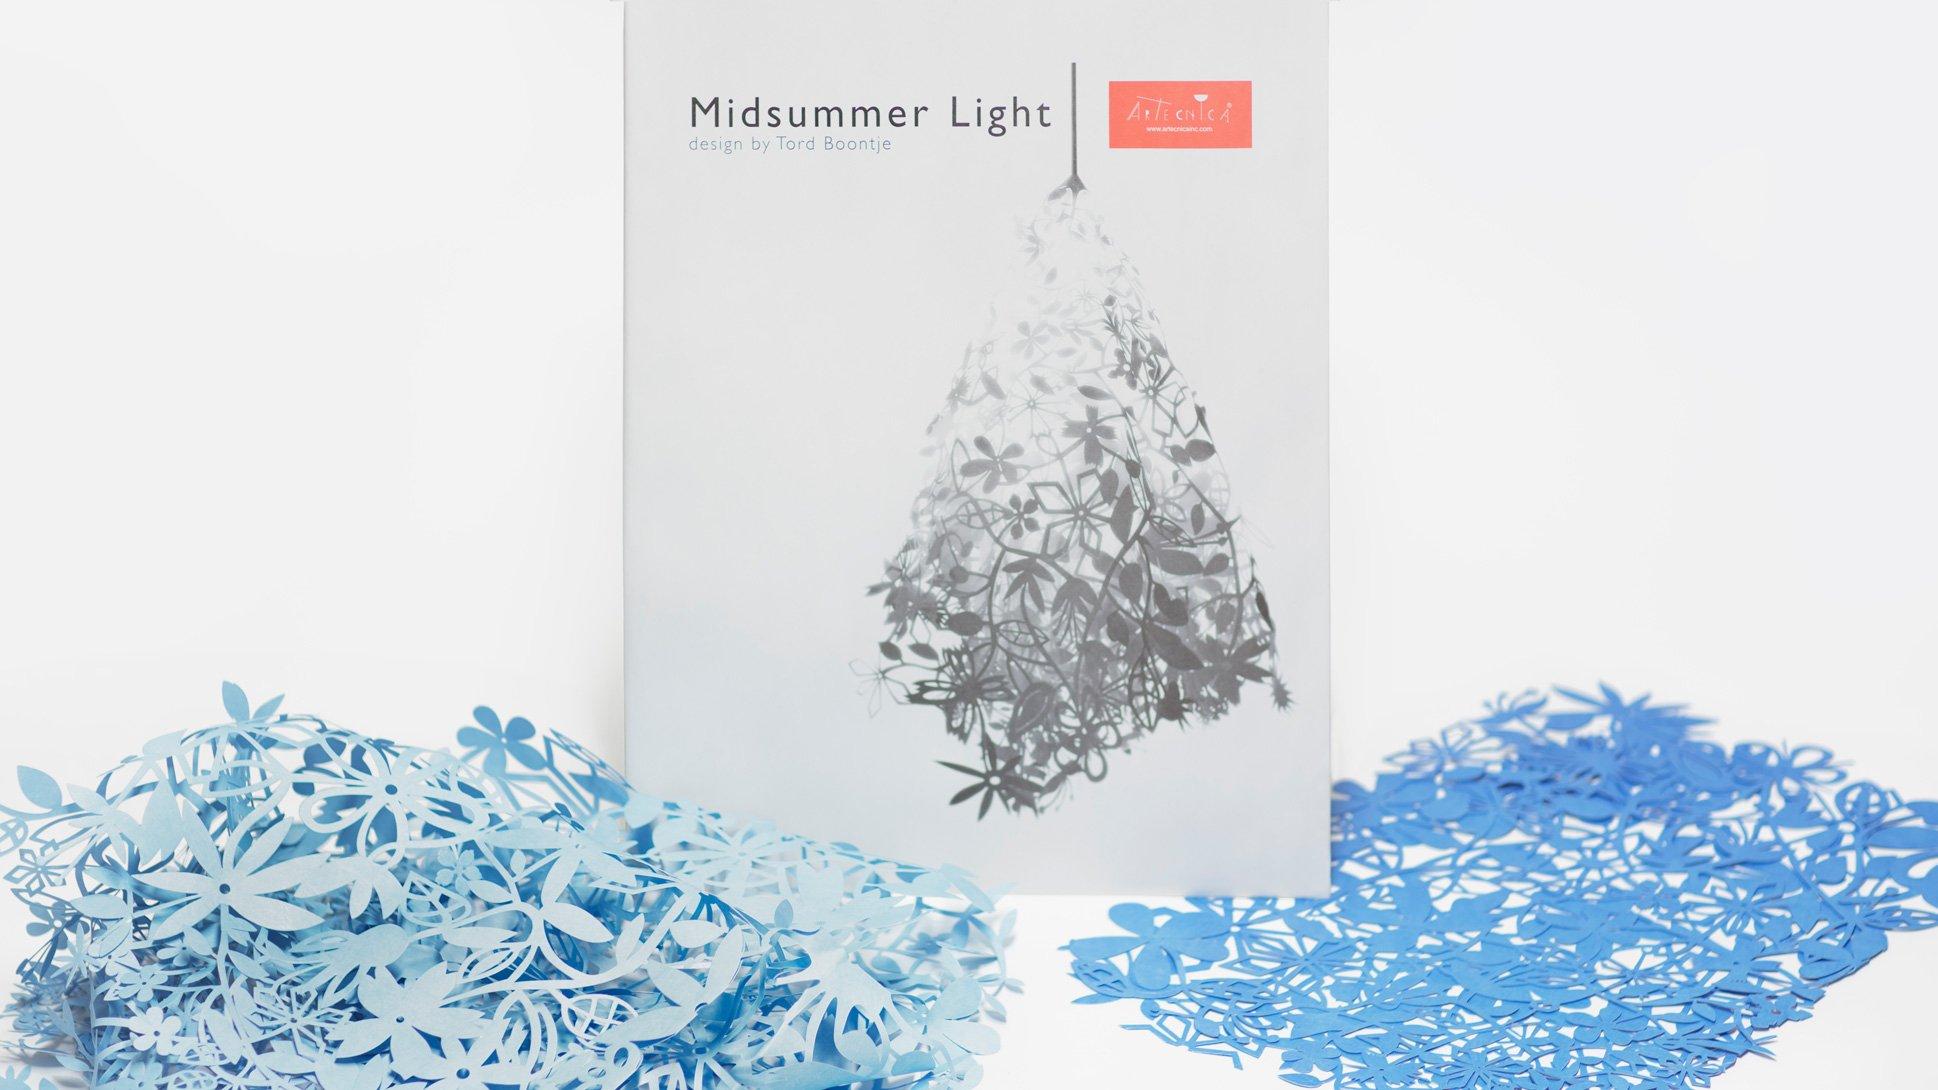 Midsummer light by Tord Boontje for Artecnica